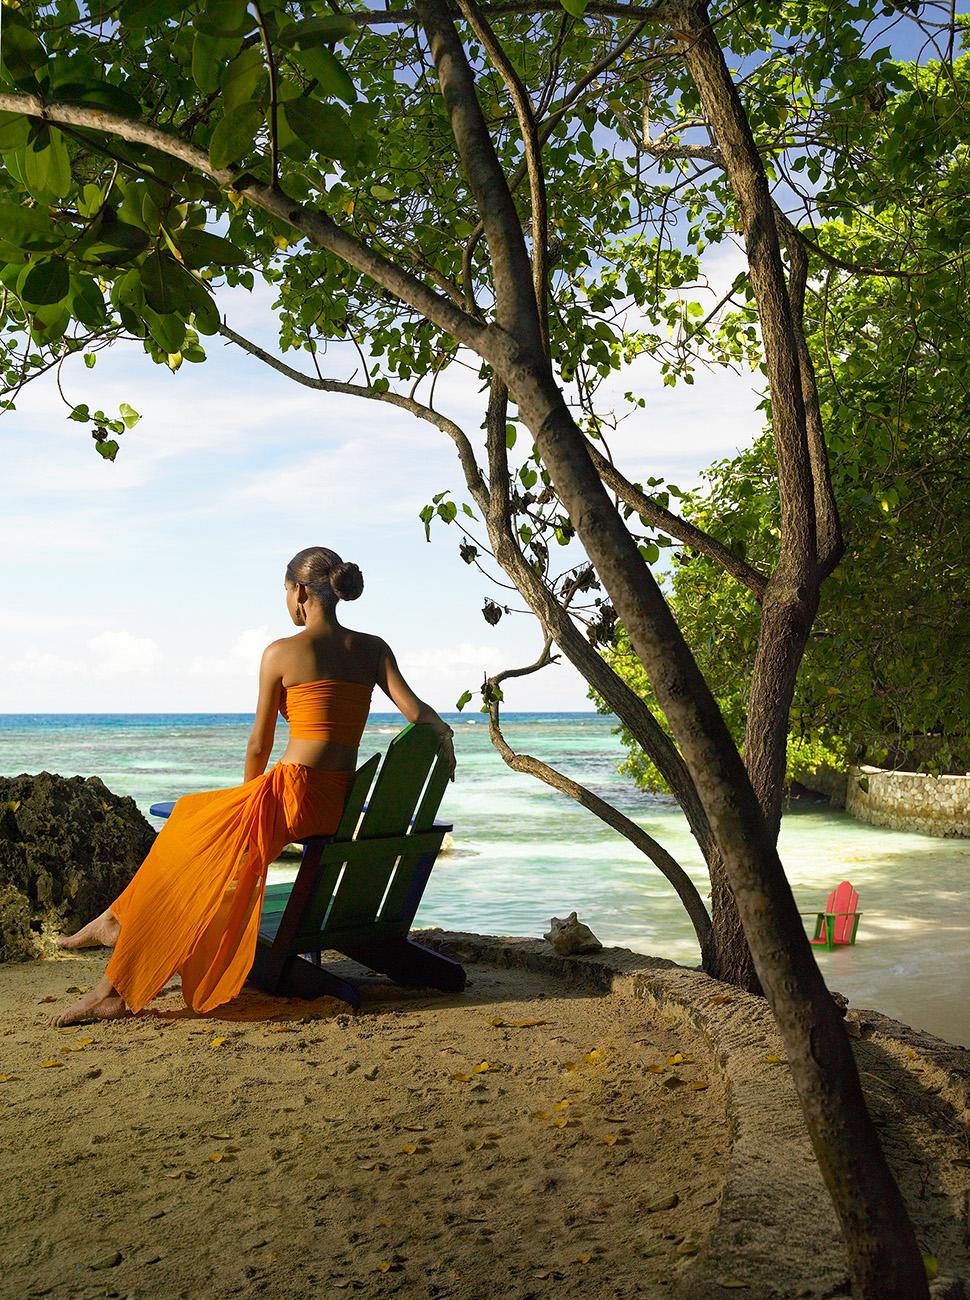 jamaican.jpg